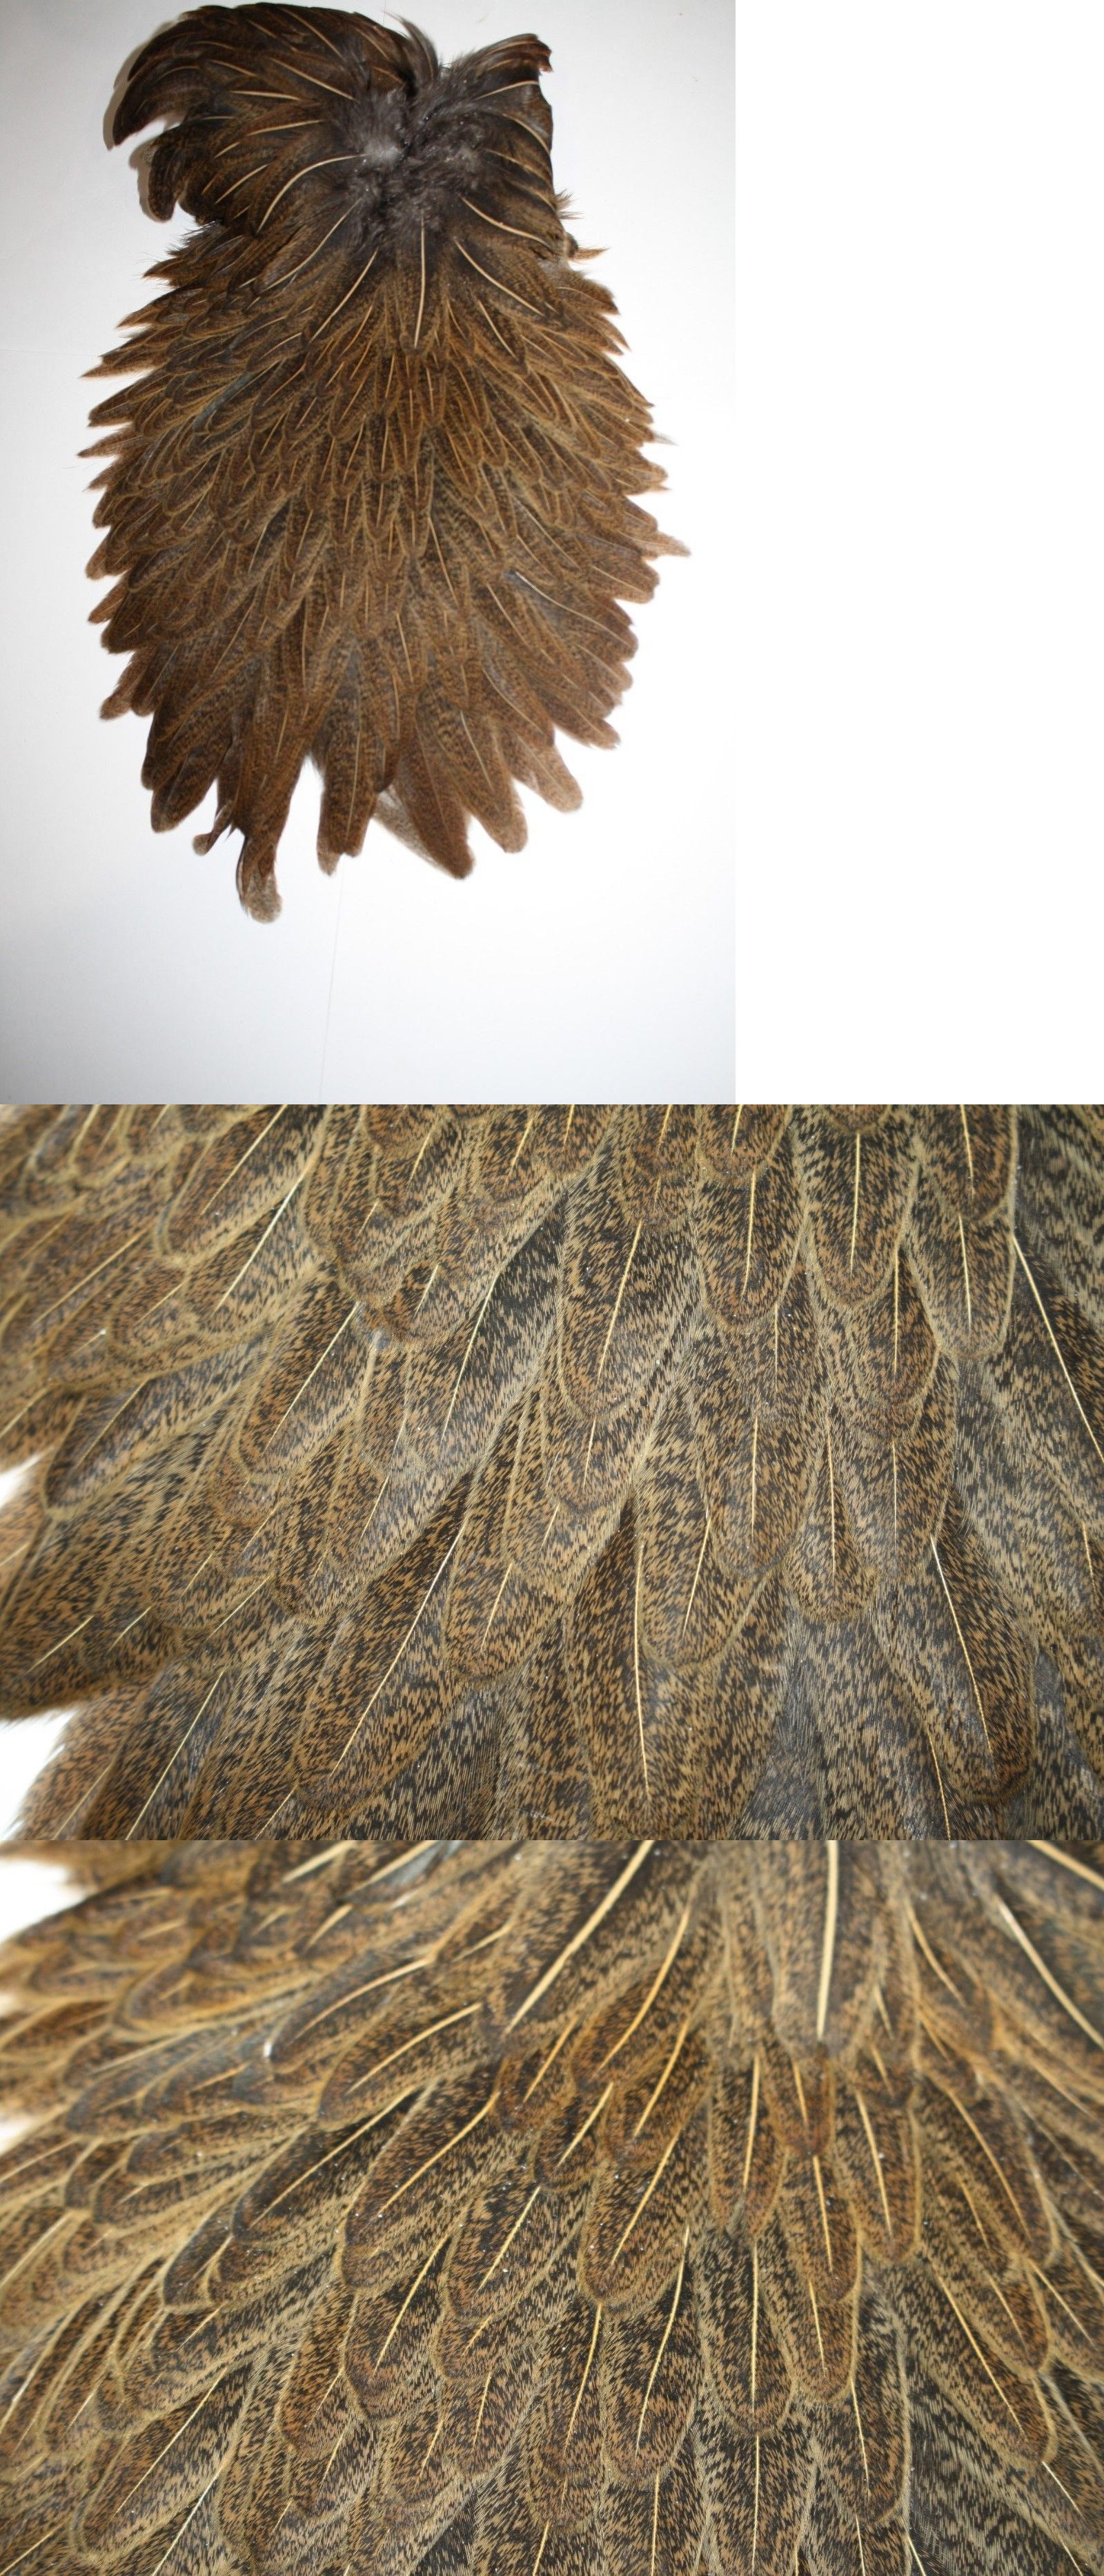 Angelsport-Köder, -Futtermittel & -Fliegen Angelsport-Artikel Fly Tying Whiting Silver Rooster Cape Light Ginger #C